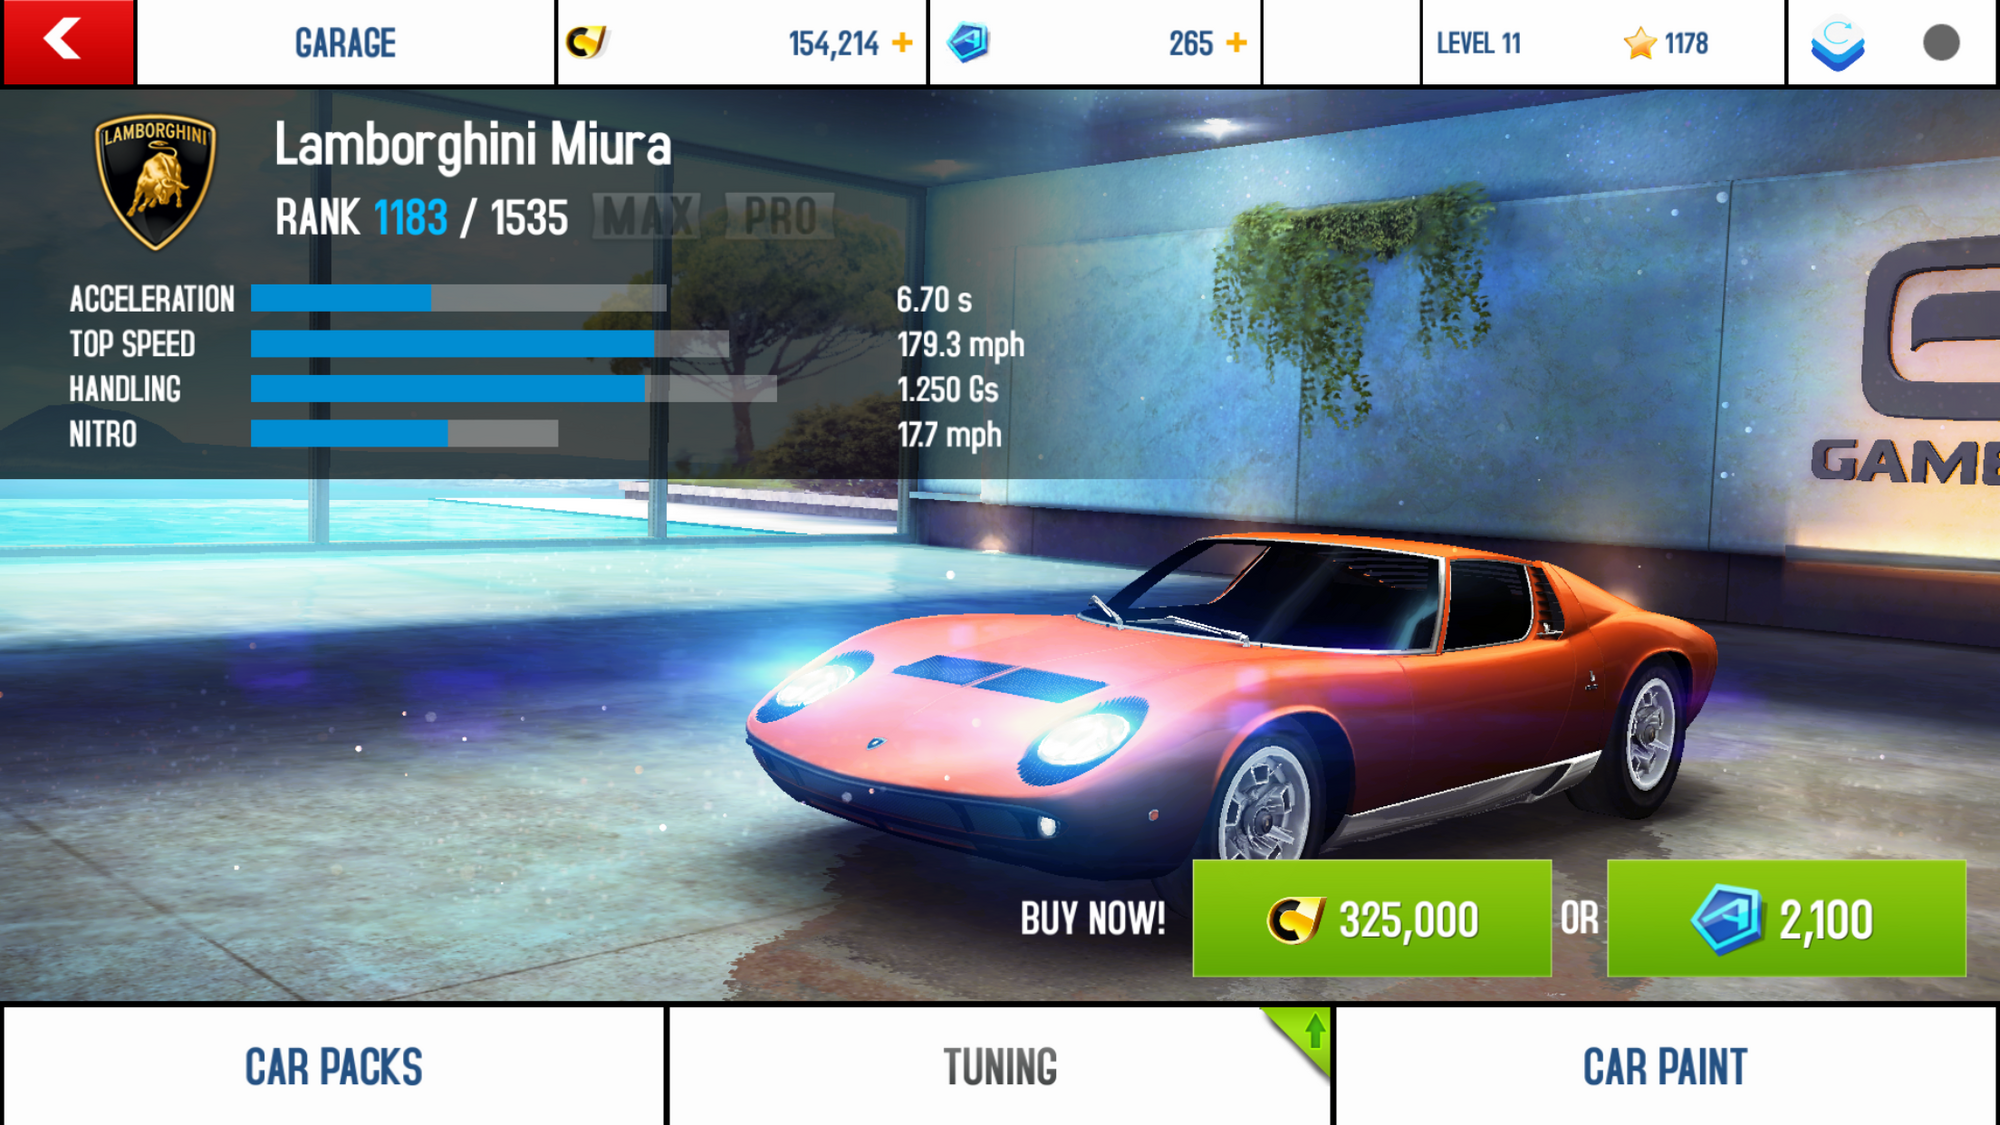 Lamborghini Miura Asphalt Wiki Fandom Powered By Wikia